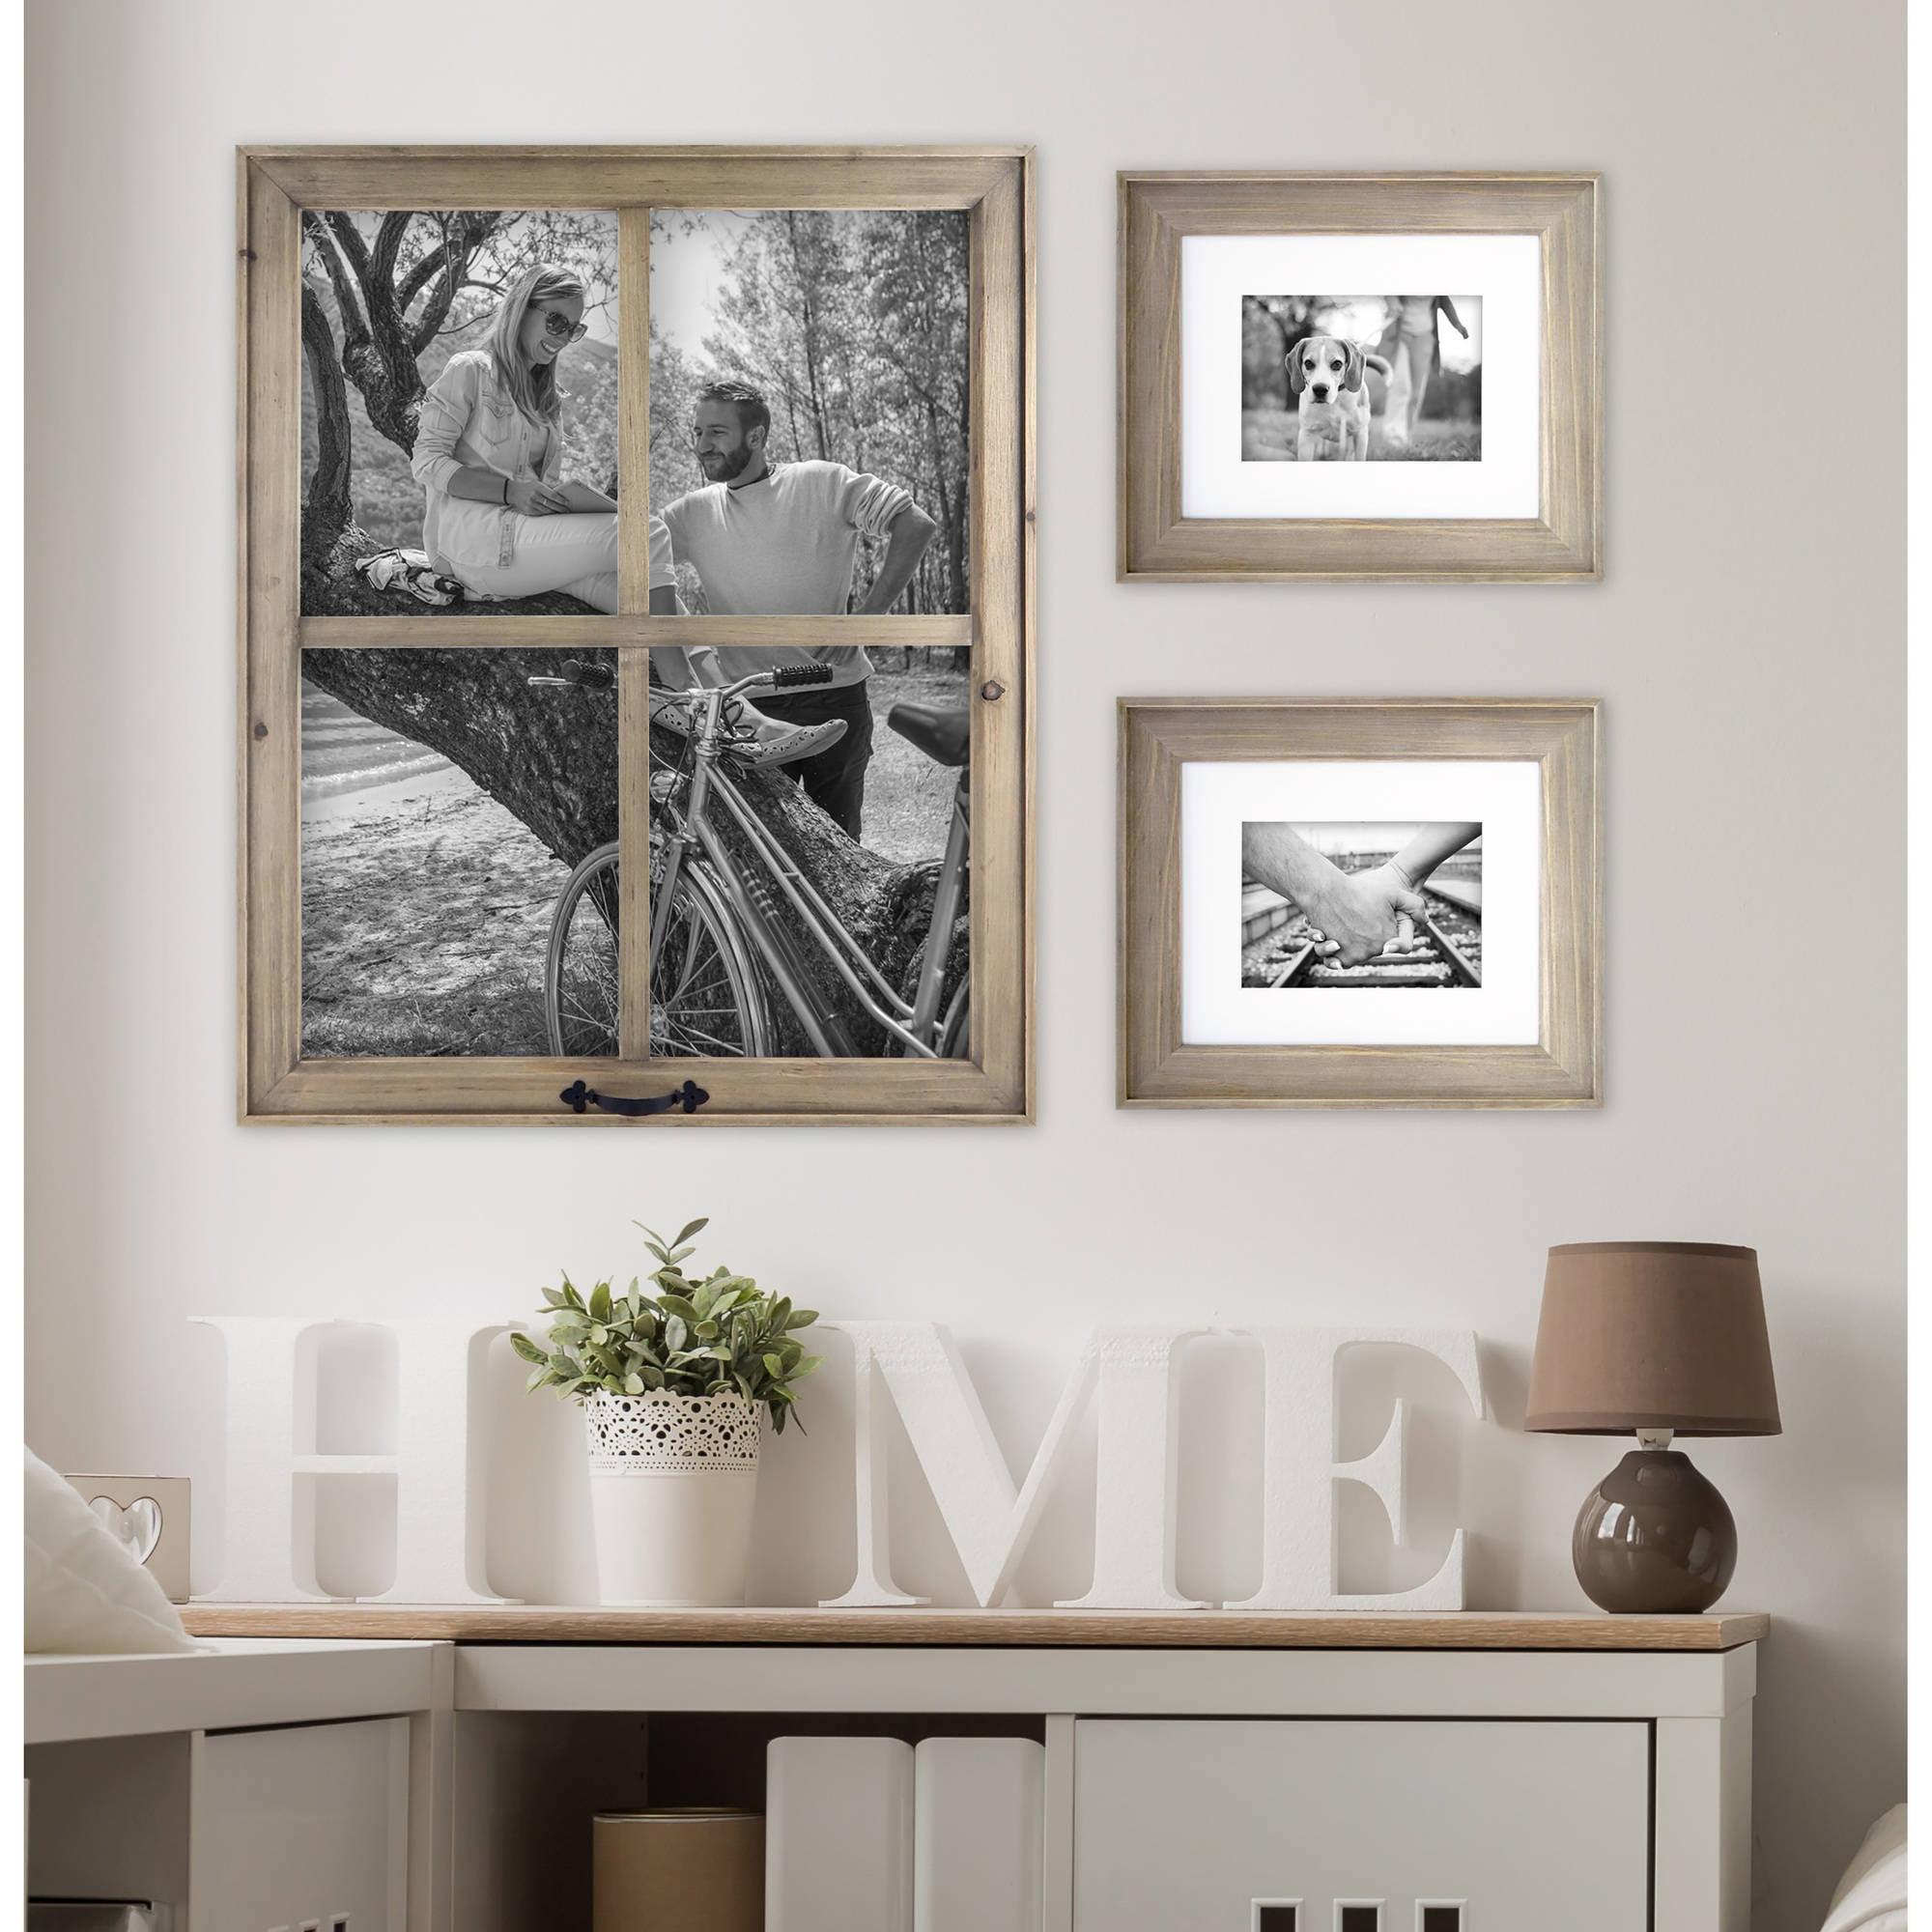 better homes gardens 4 open windowpane frame walmartcom - Window Pane Picture Frames